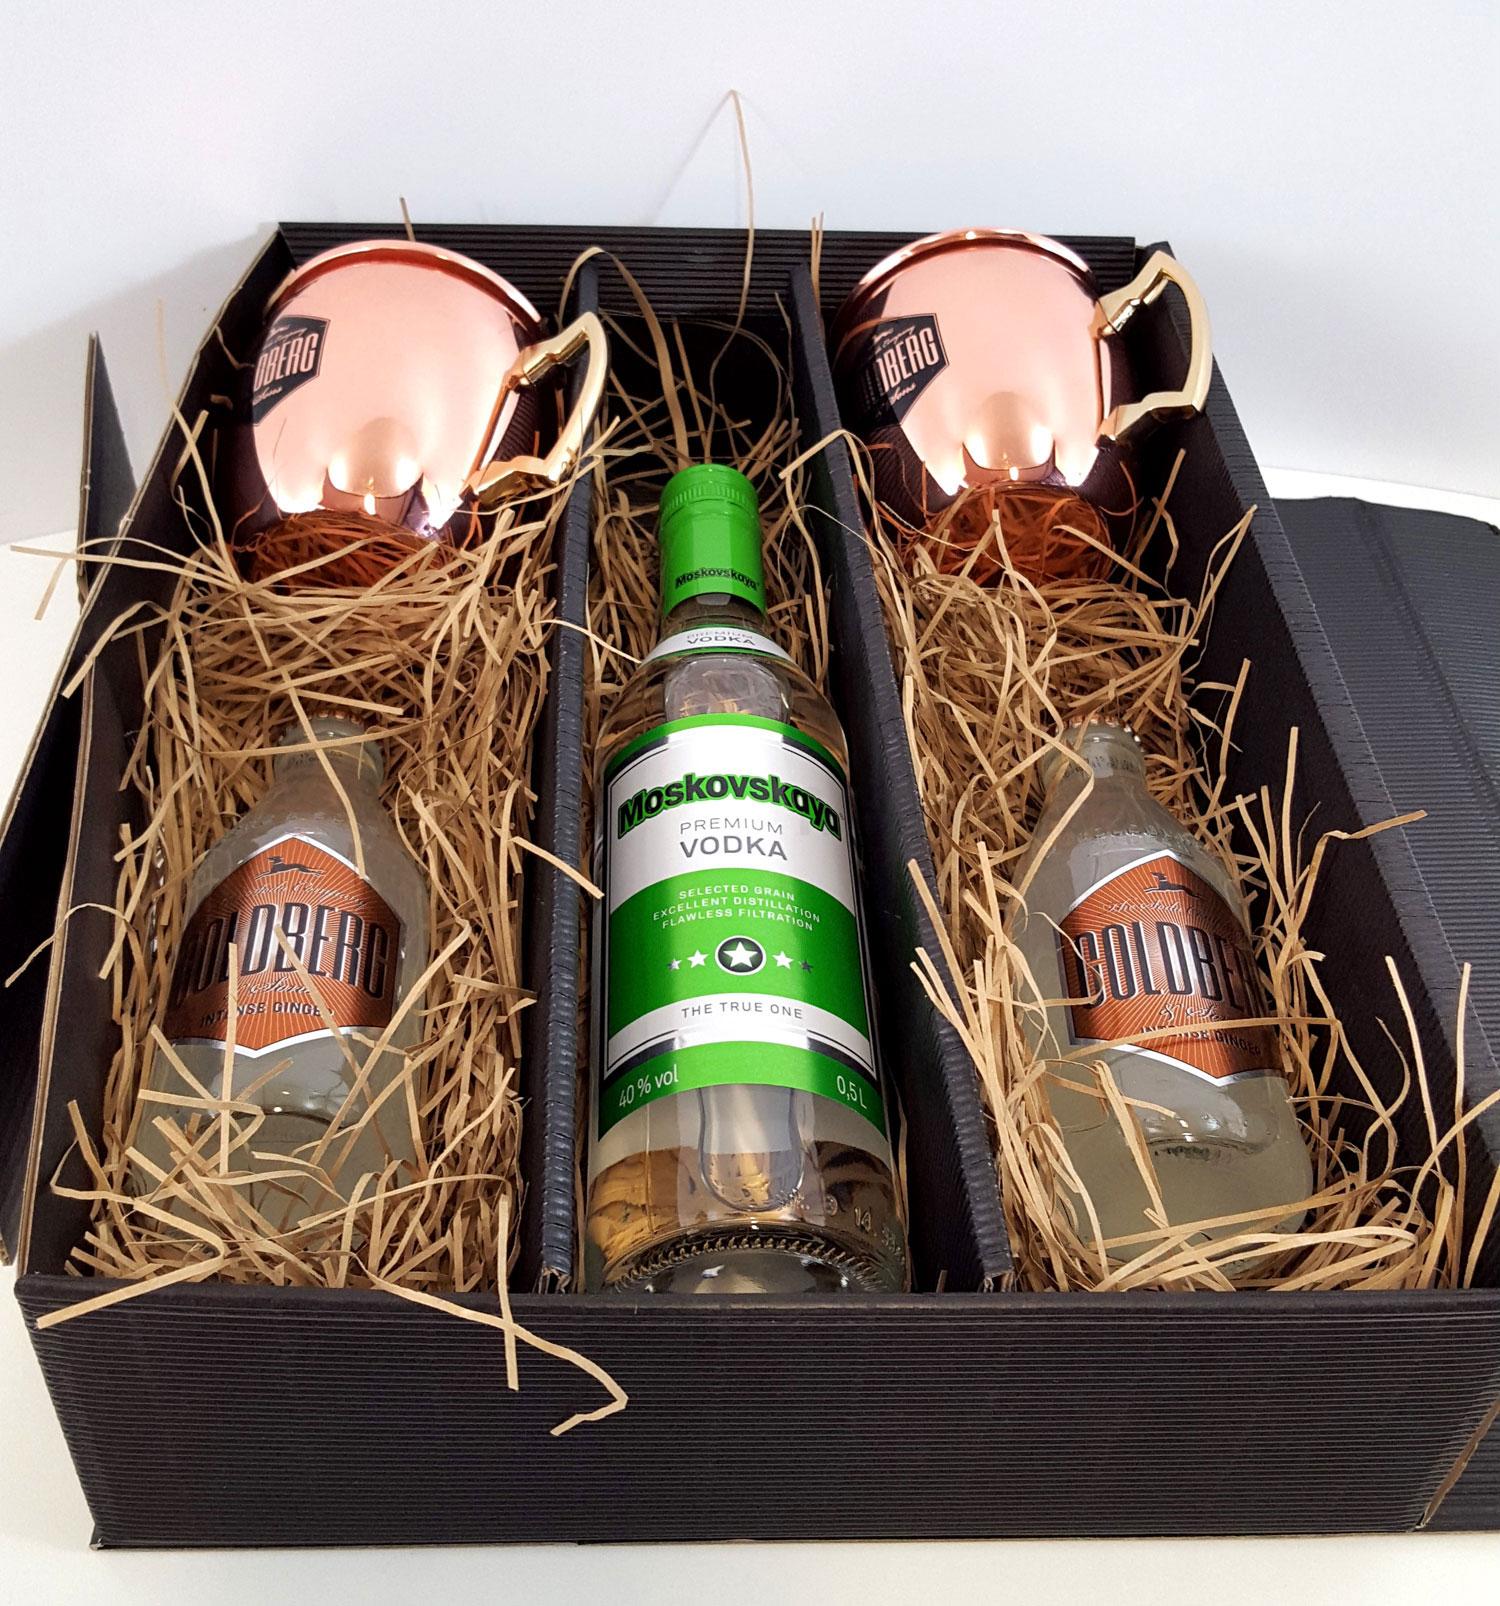 Moscow Mule Set / Geschenkset - Moskovskaya Vodka 0,7l 700ml (40% Vol) + 2x Goldberg Kupferbecher + 2x Goldberg Intense Ginger 200ml - Inkl. Pfand MEHRWEG